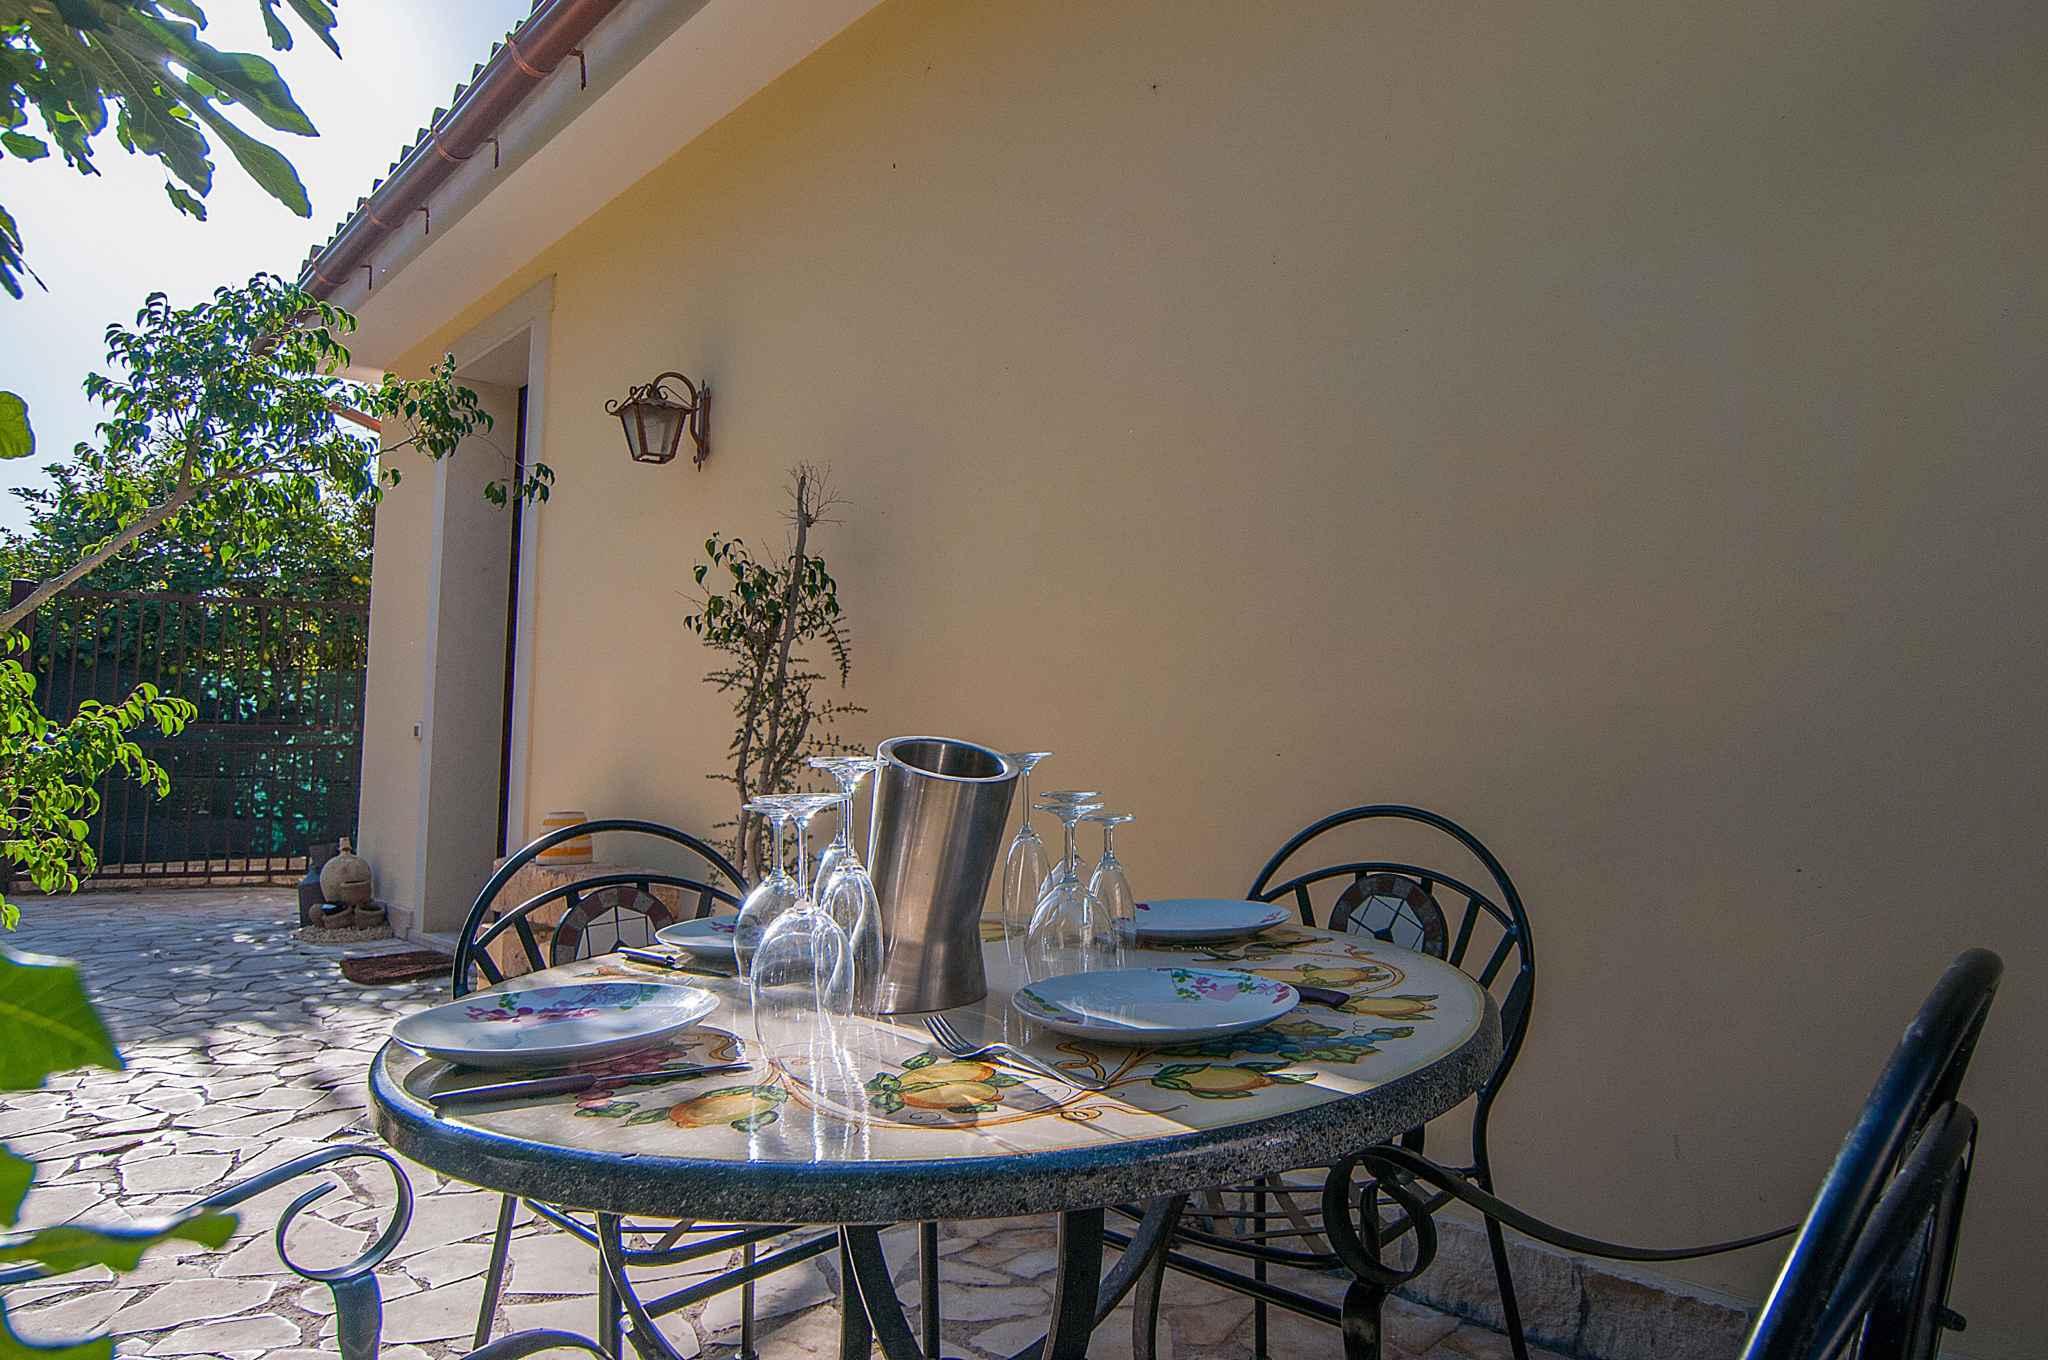 Maison de vacances mit Blick auf Zitronengarten (317534), Lido di Noto, Siracusa, Sicile, Italie, image 8